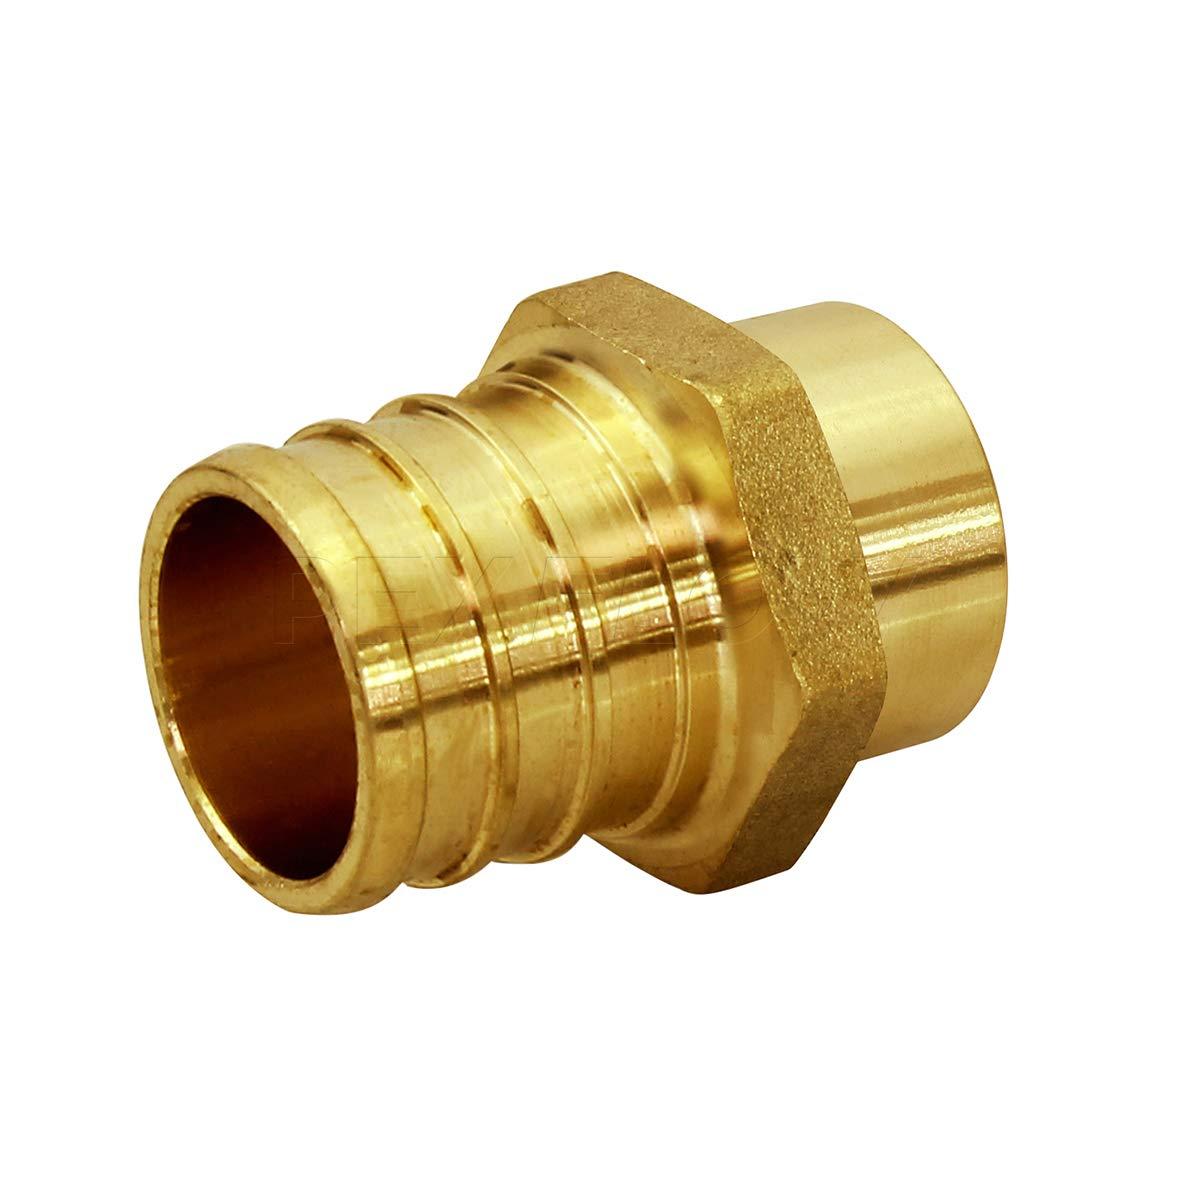 Pexflow PSMA3412-NL Male Sweat Adapter X Pex Barb Pipe Fitting 3//4 X 1//2 Brass